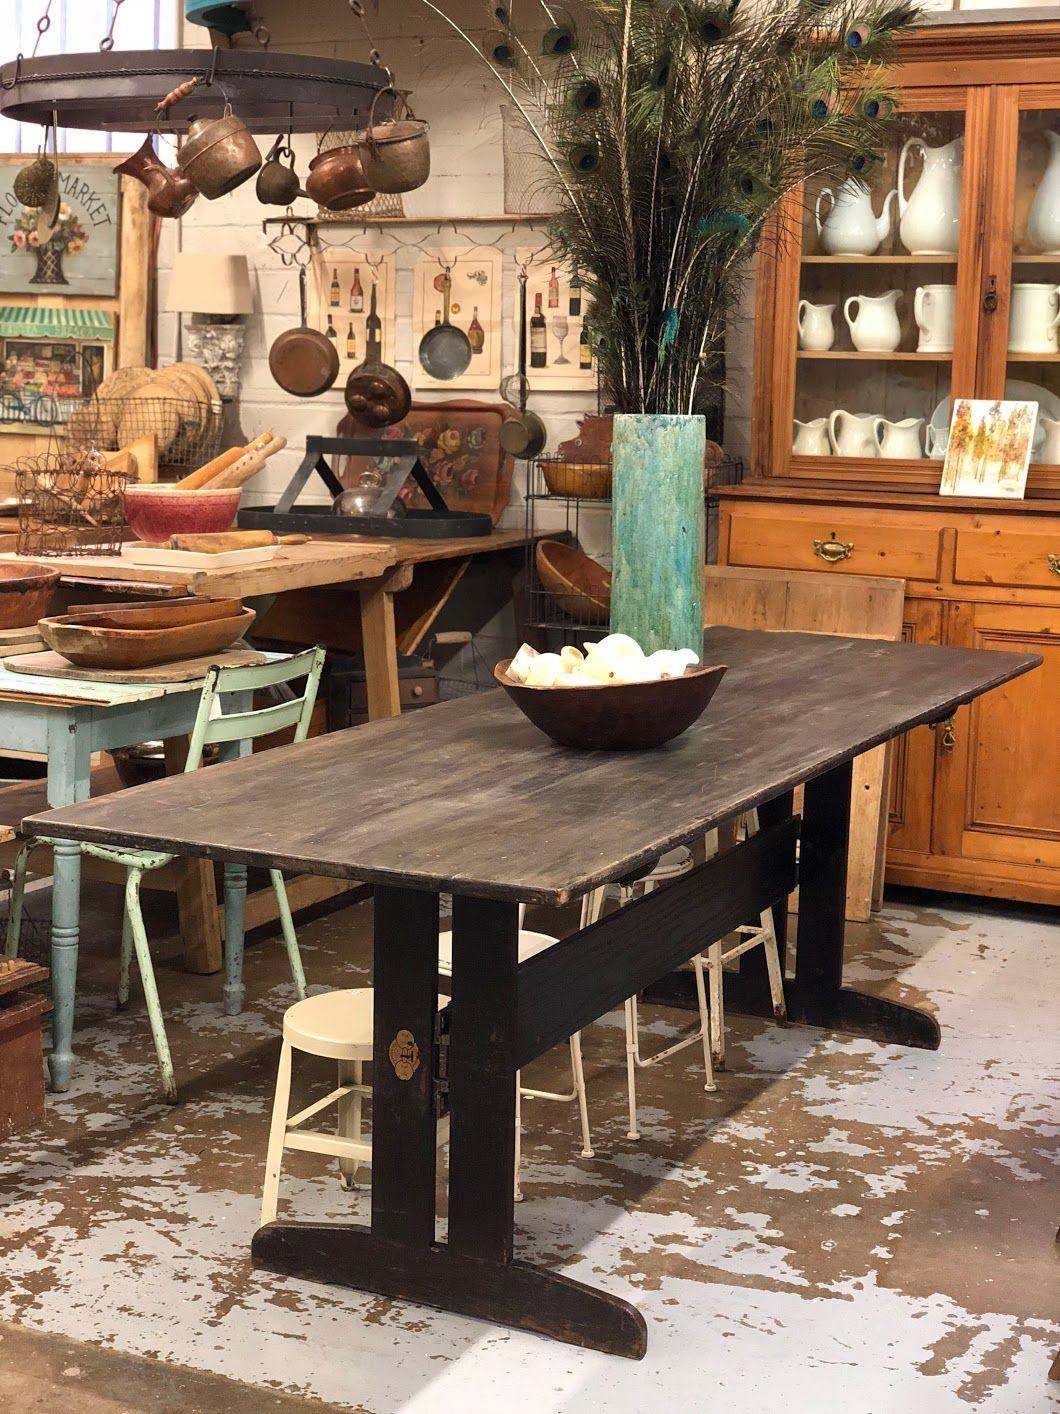 Black farmhouse or lodge harvest table 8 long x 30 wide